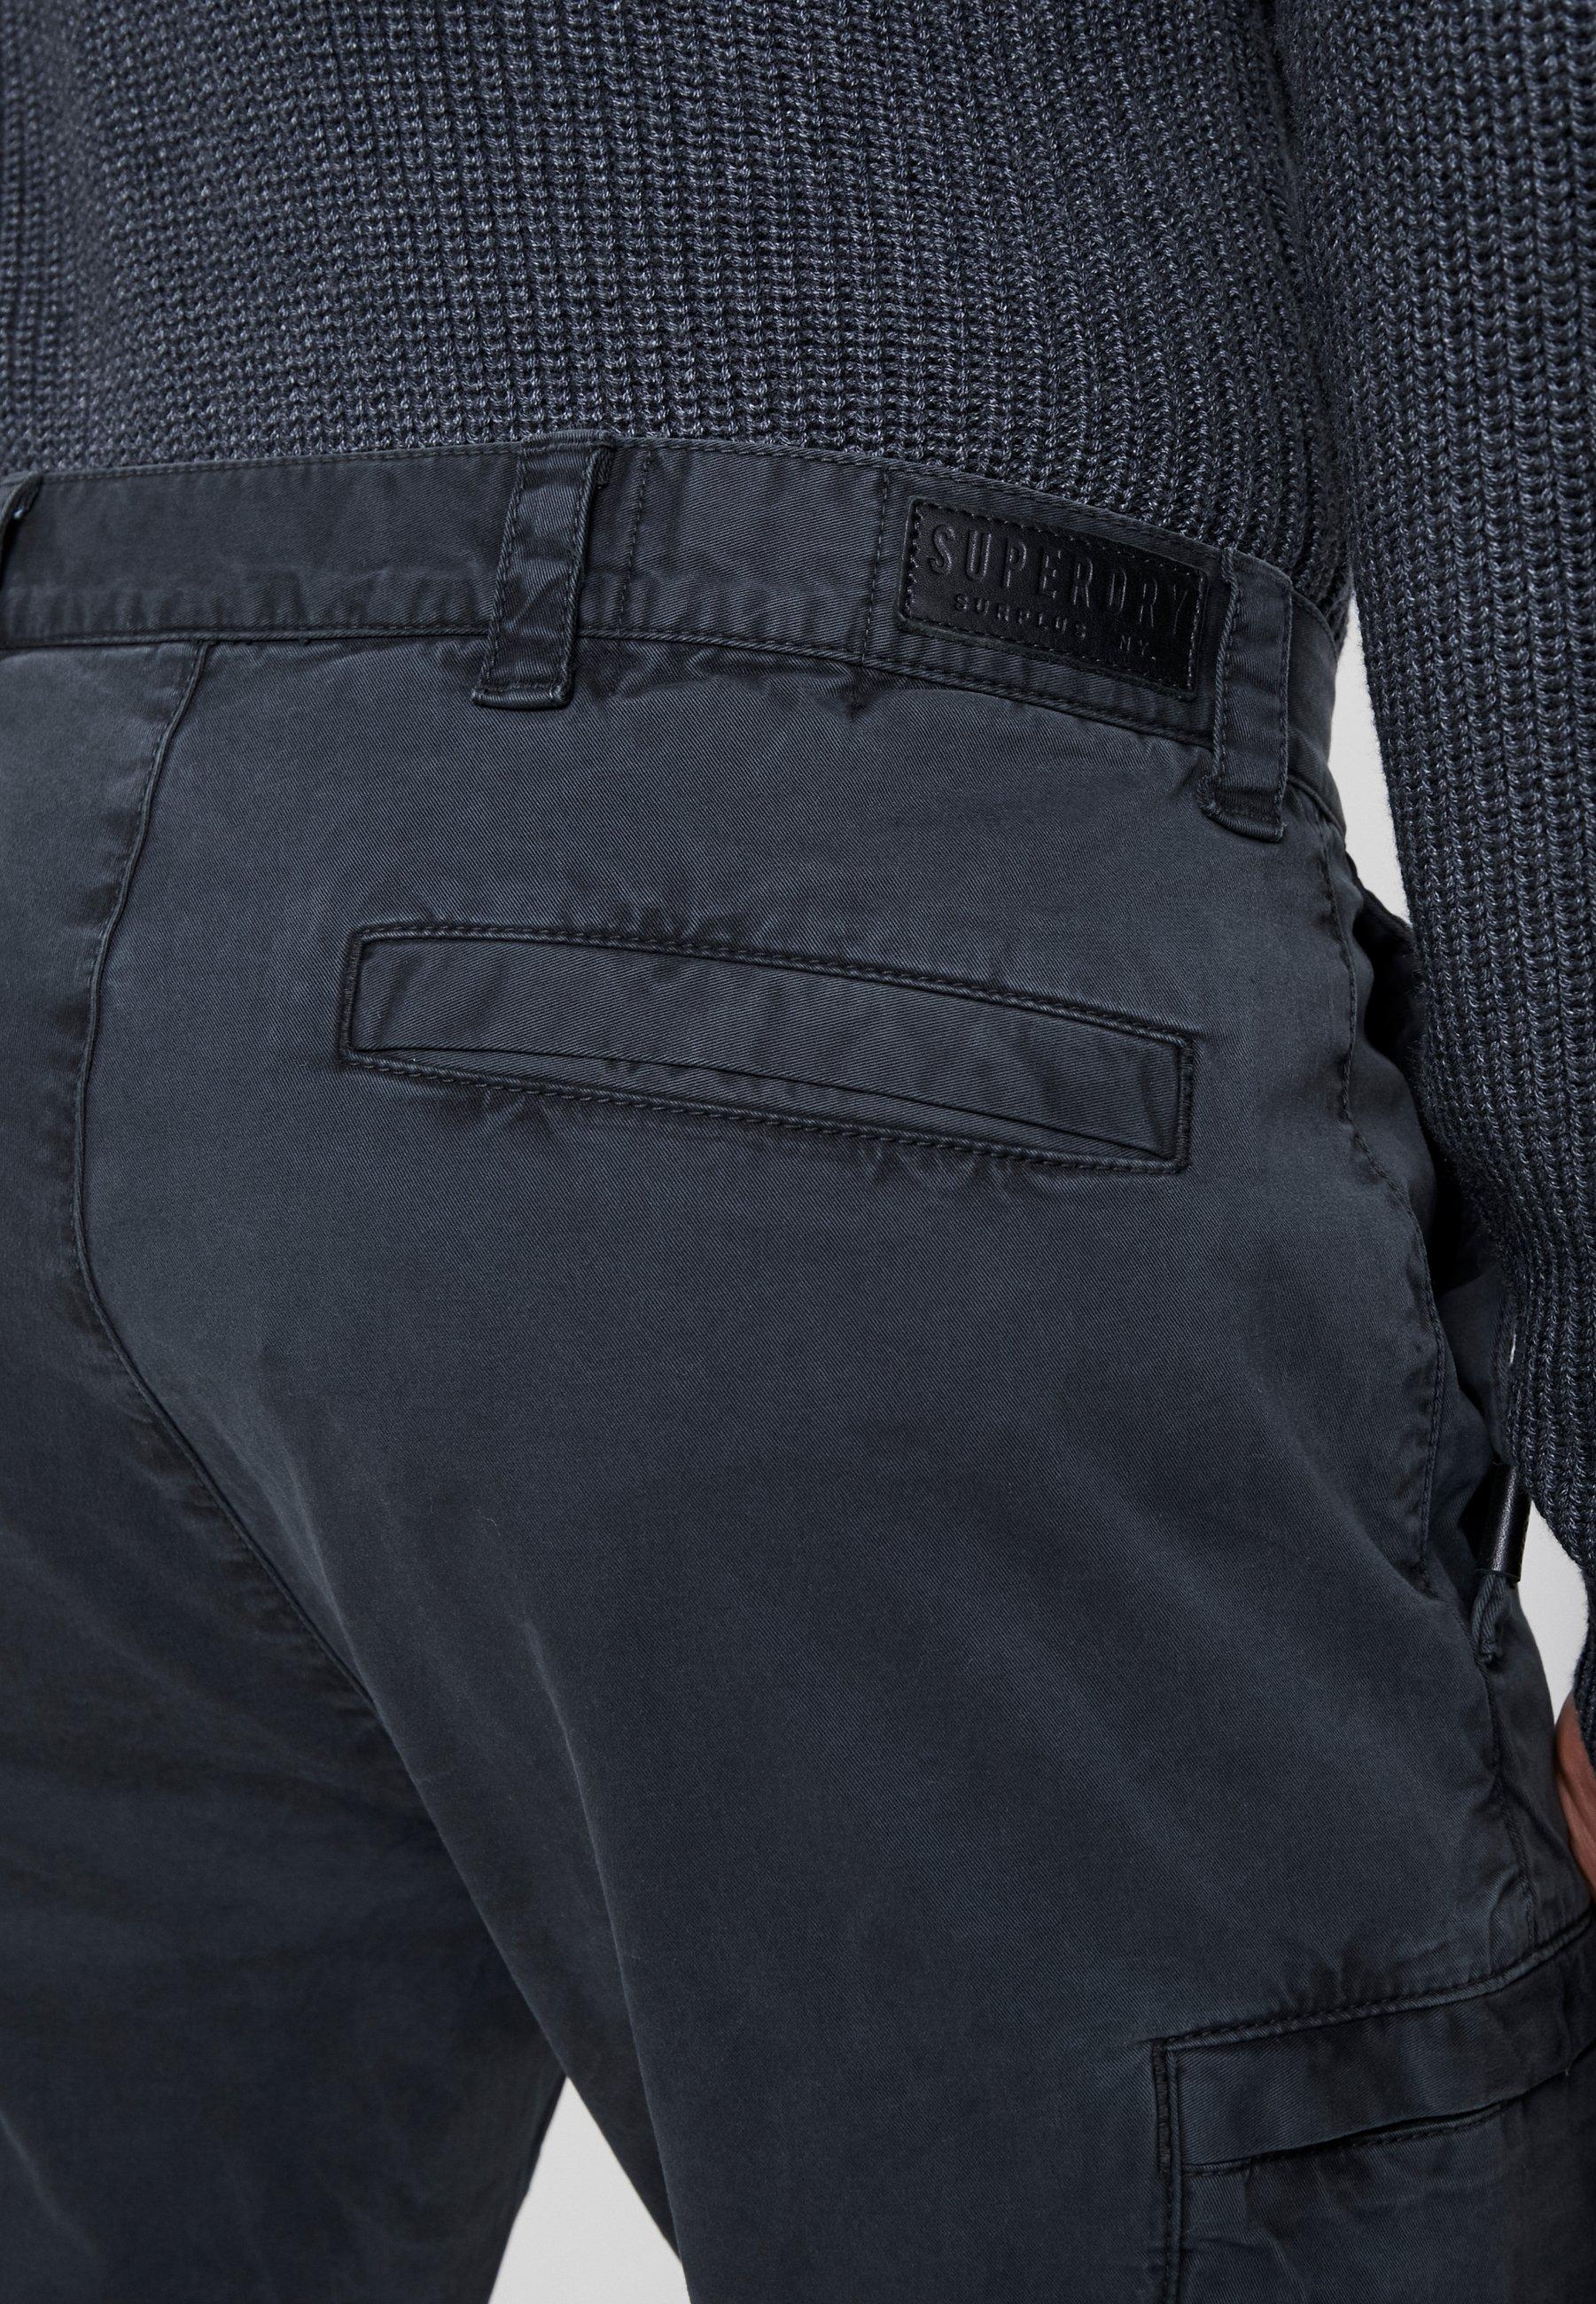 Superdry SURPLUS AVIATOR PANT - Pantalon cargo - washed black